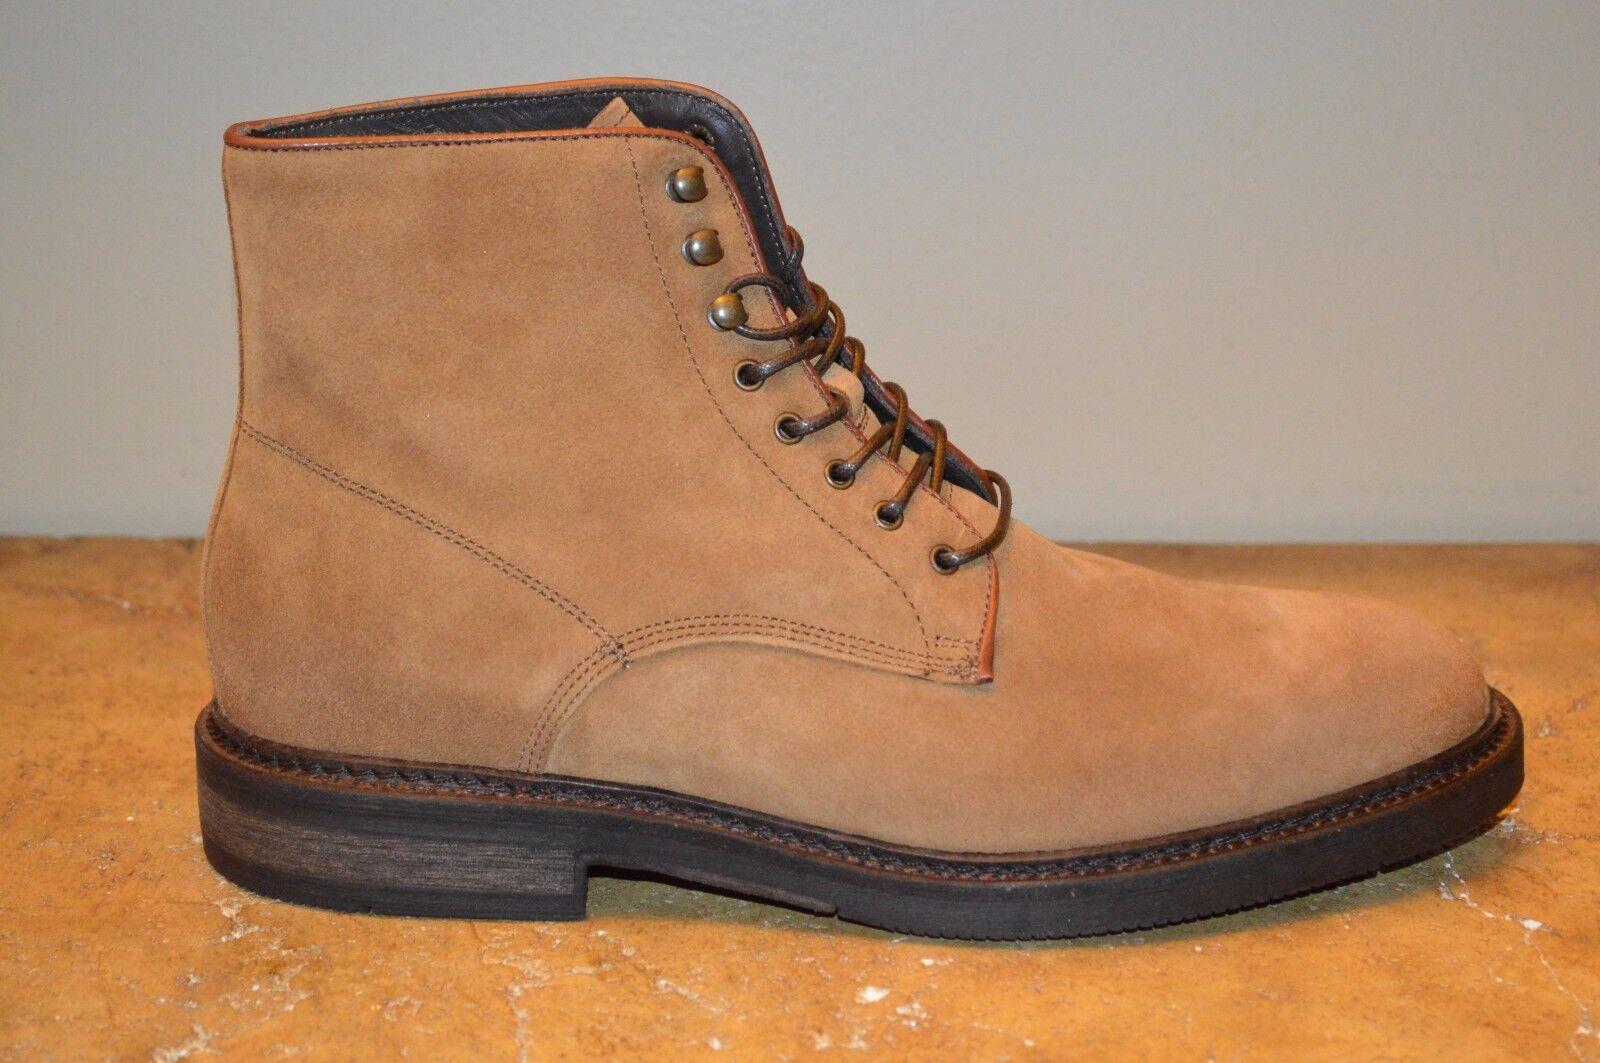 A.Testoni Tan Pelle Uomo Ankle Stivali Size 9 MSRP  600